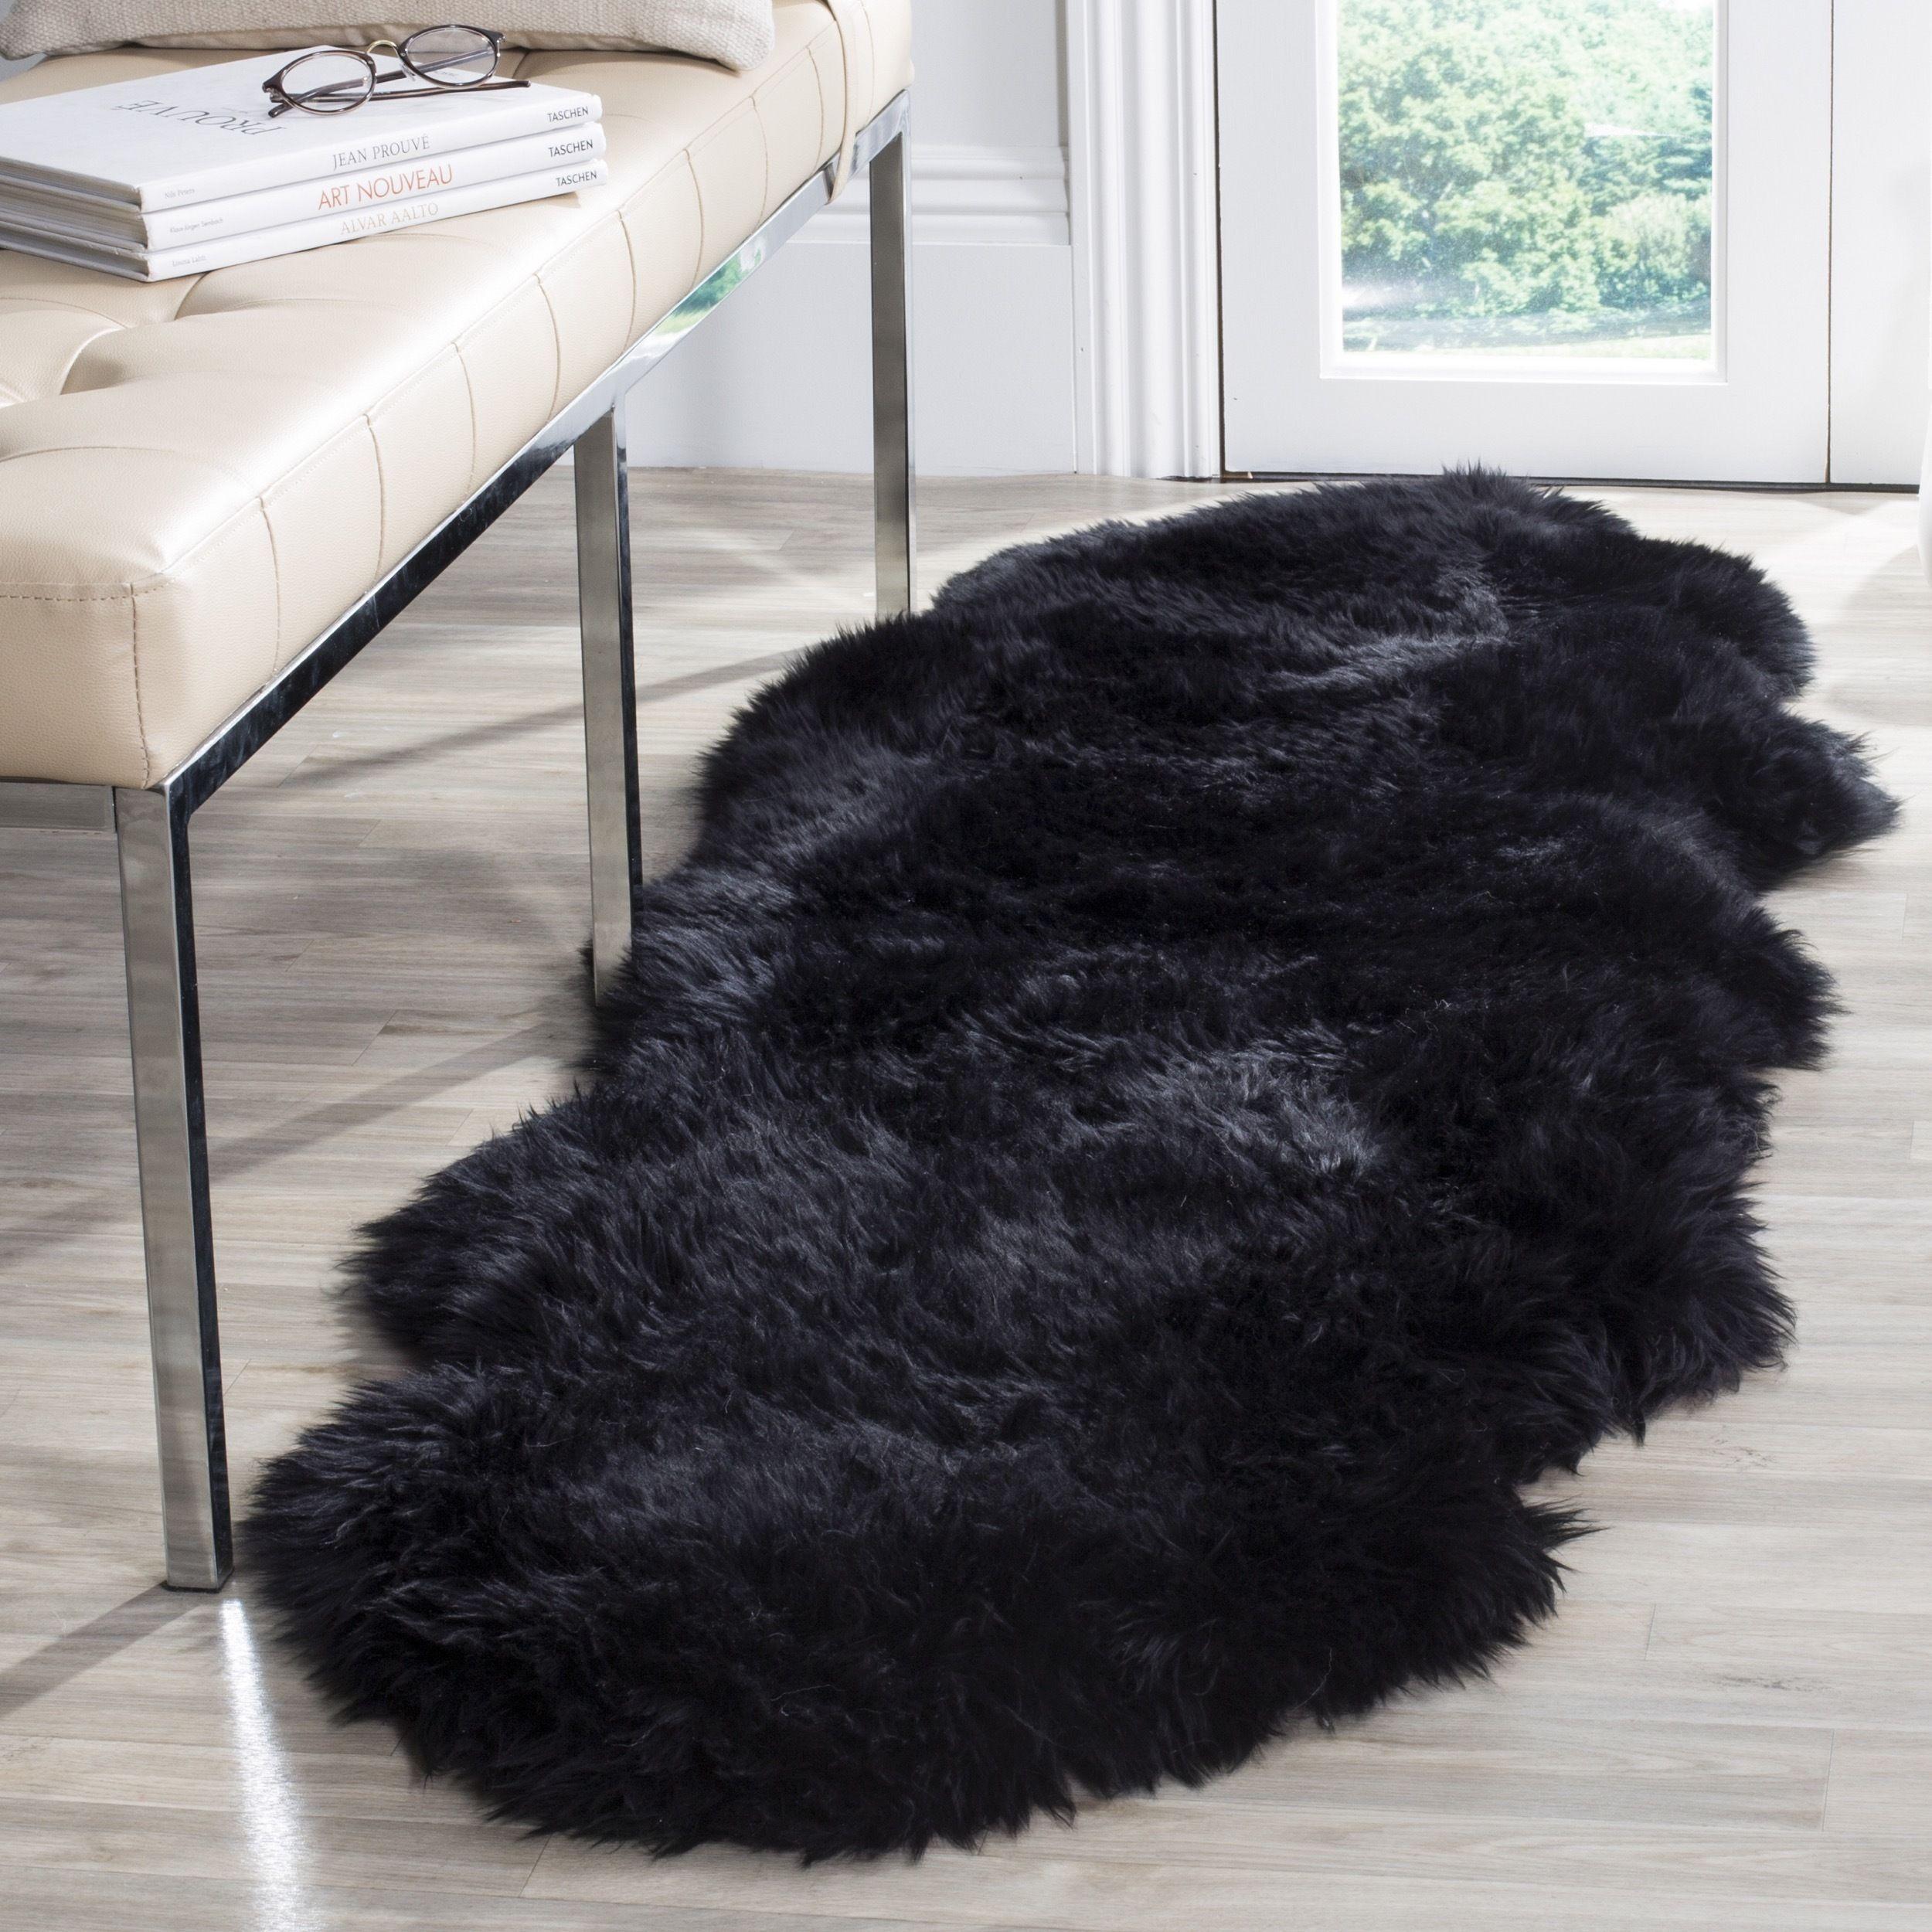 Safavieh Prairie Natural Pelt Sheepskin Wool Midnight Black Shag Rug 2 X 6